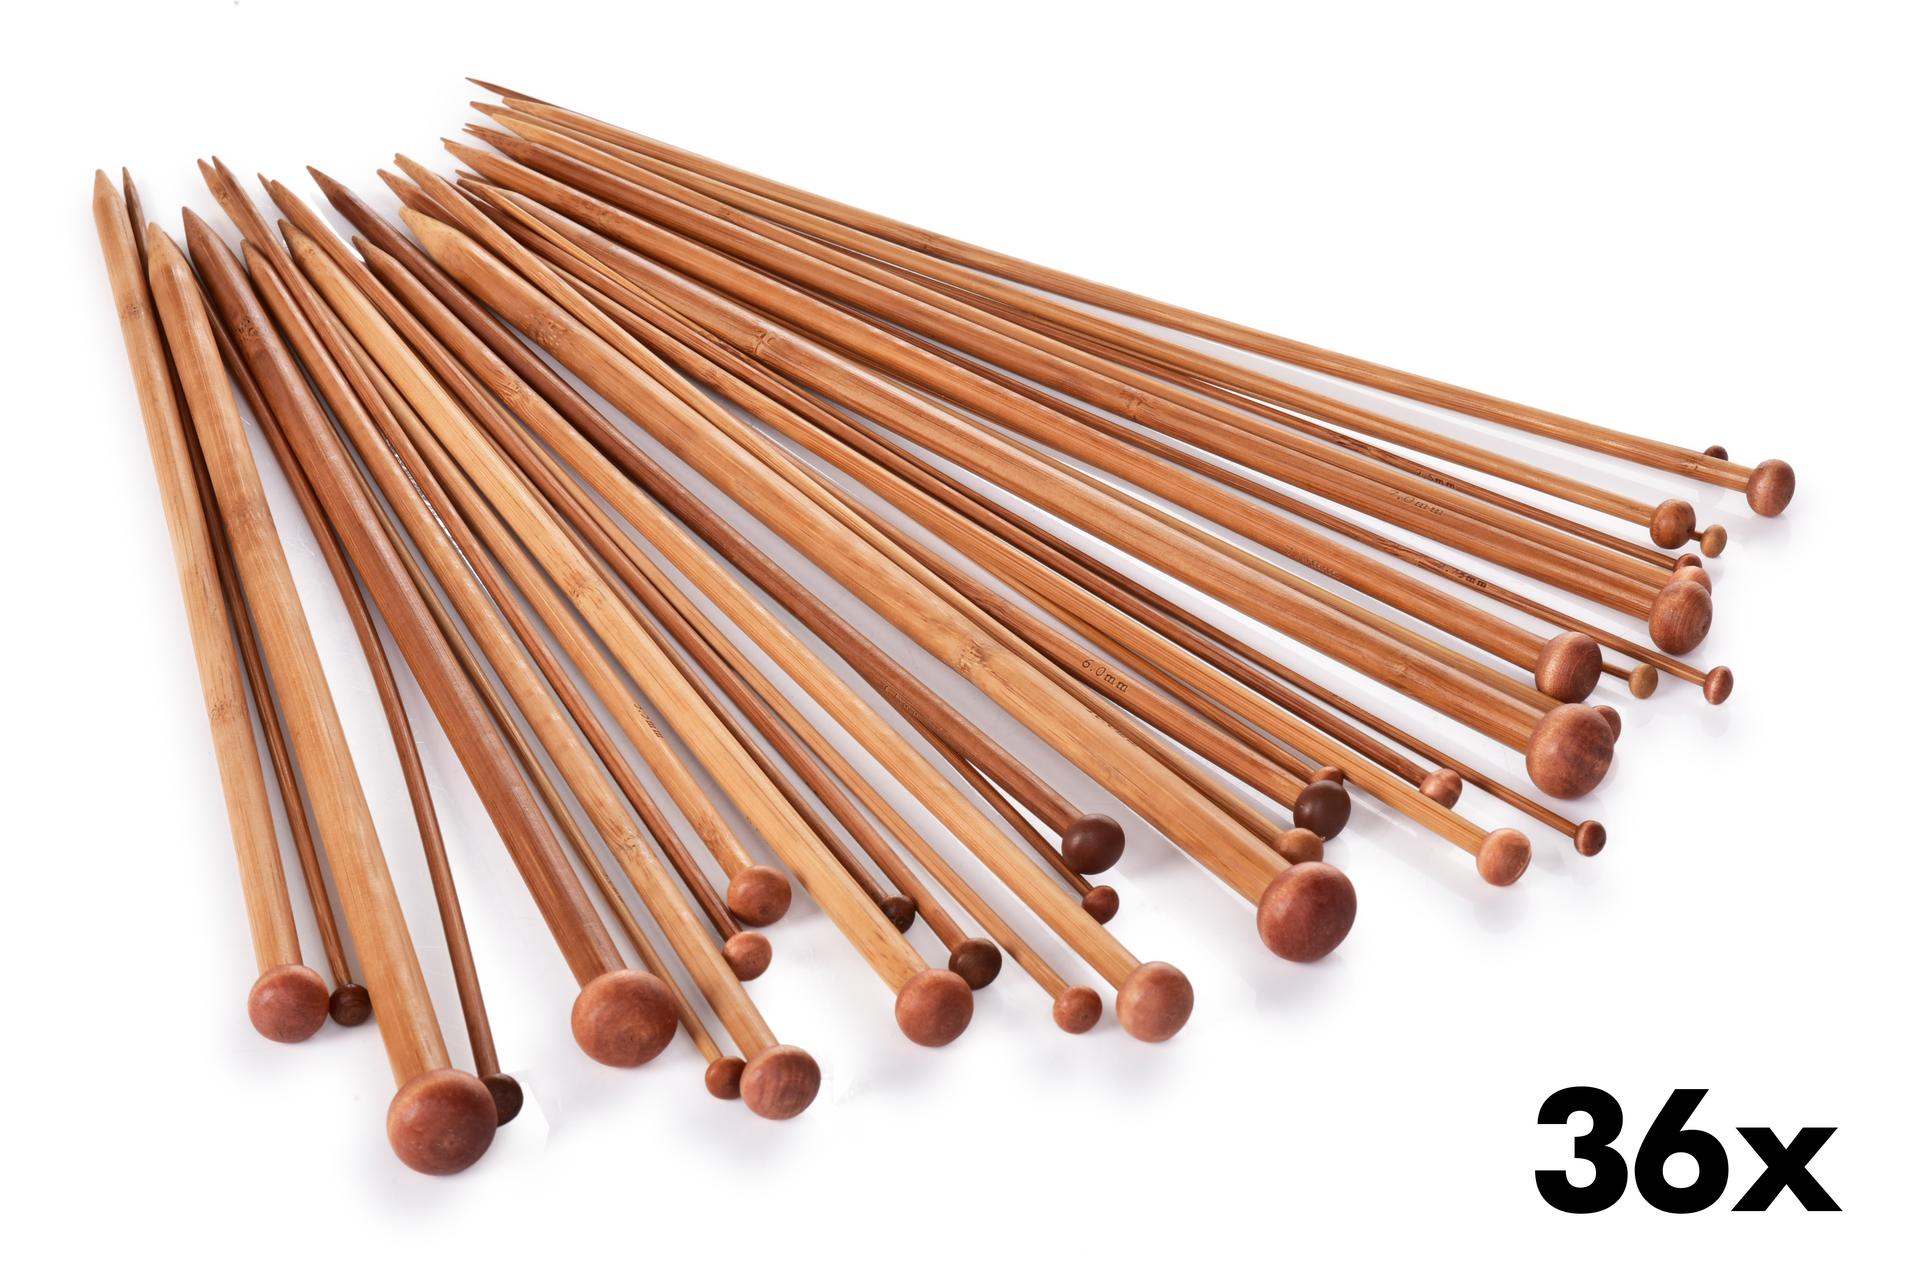 36 ks sada klasických bambusových jehlic GoEco®